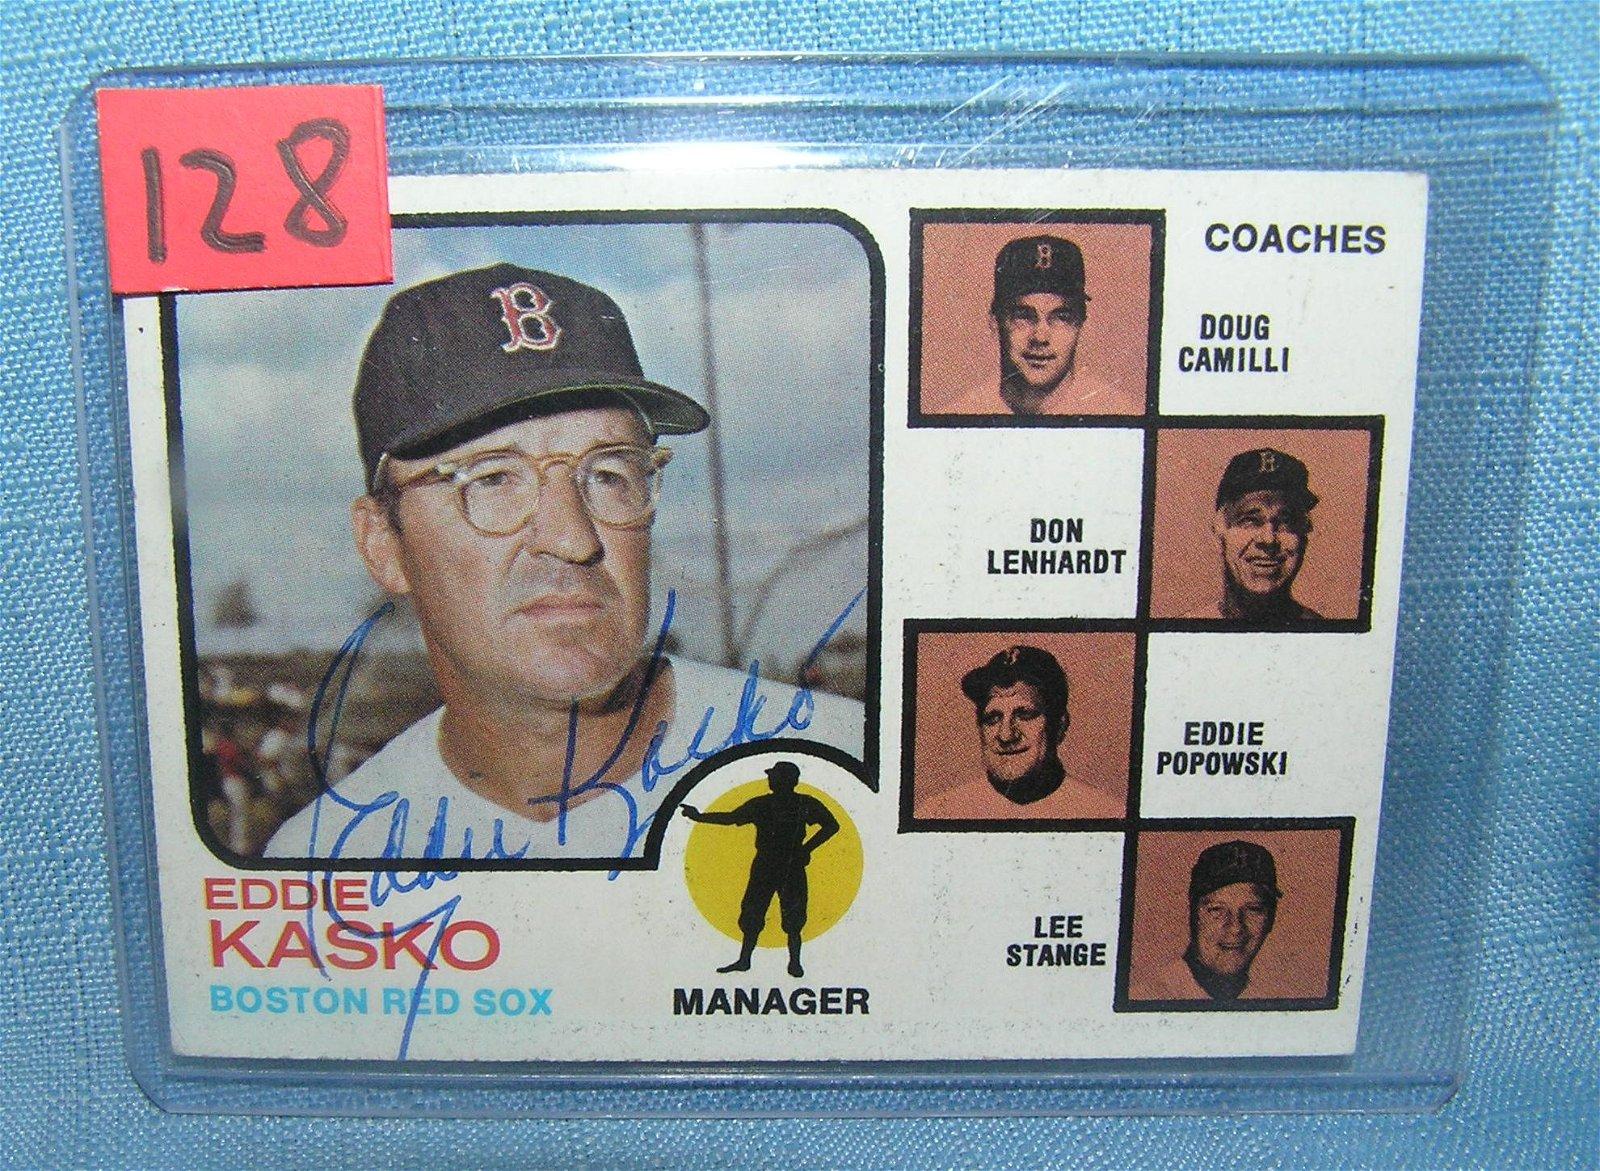 Eddie Kasko autographed Red Sox baseball card